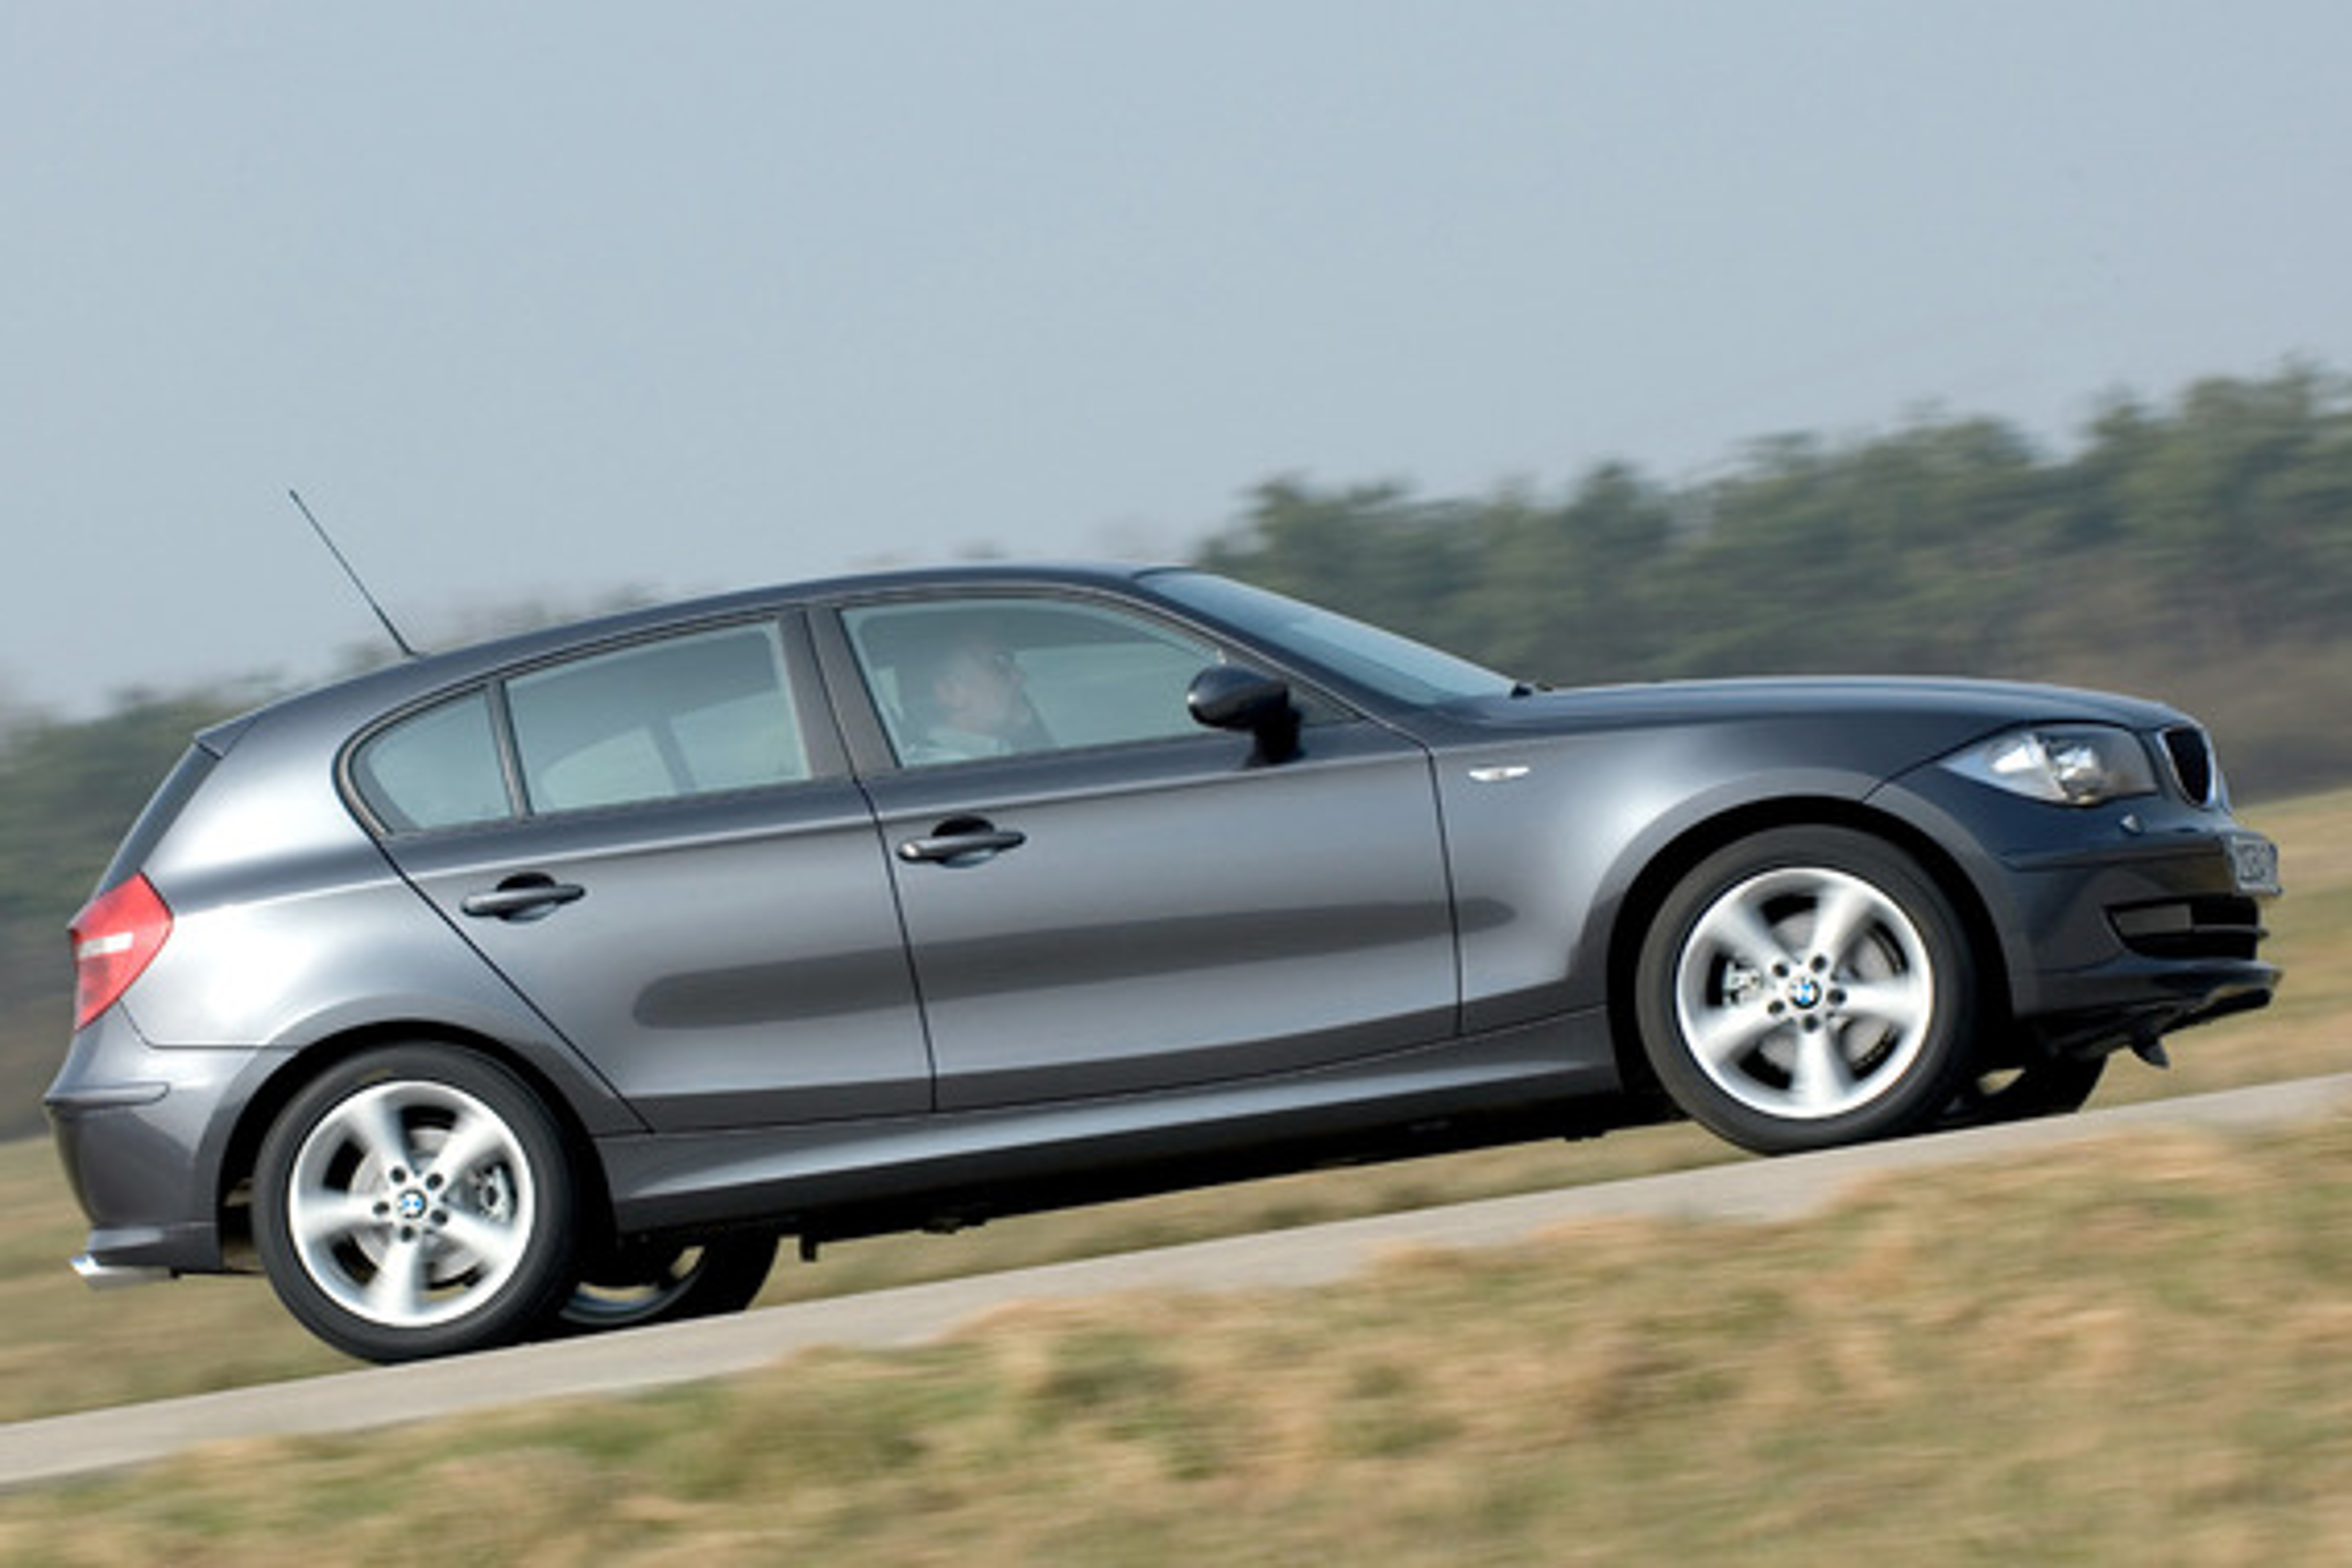 Настройка дистанционного отпирания дверей на BMW 1-Series